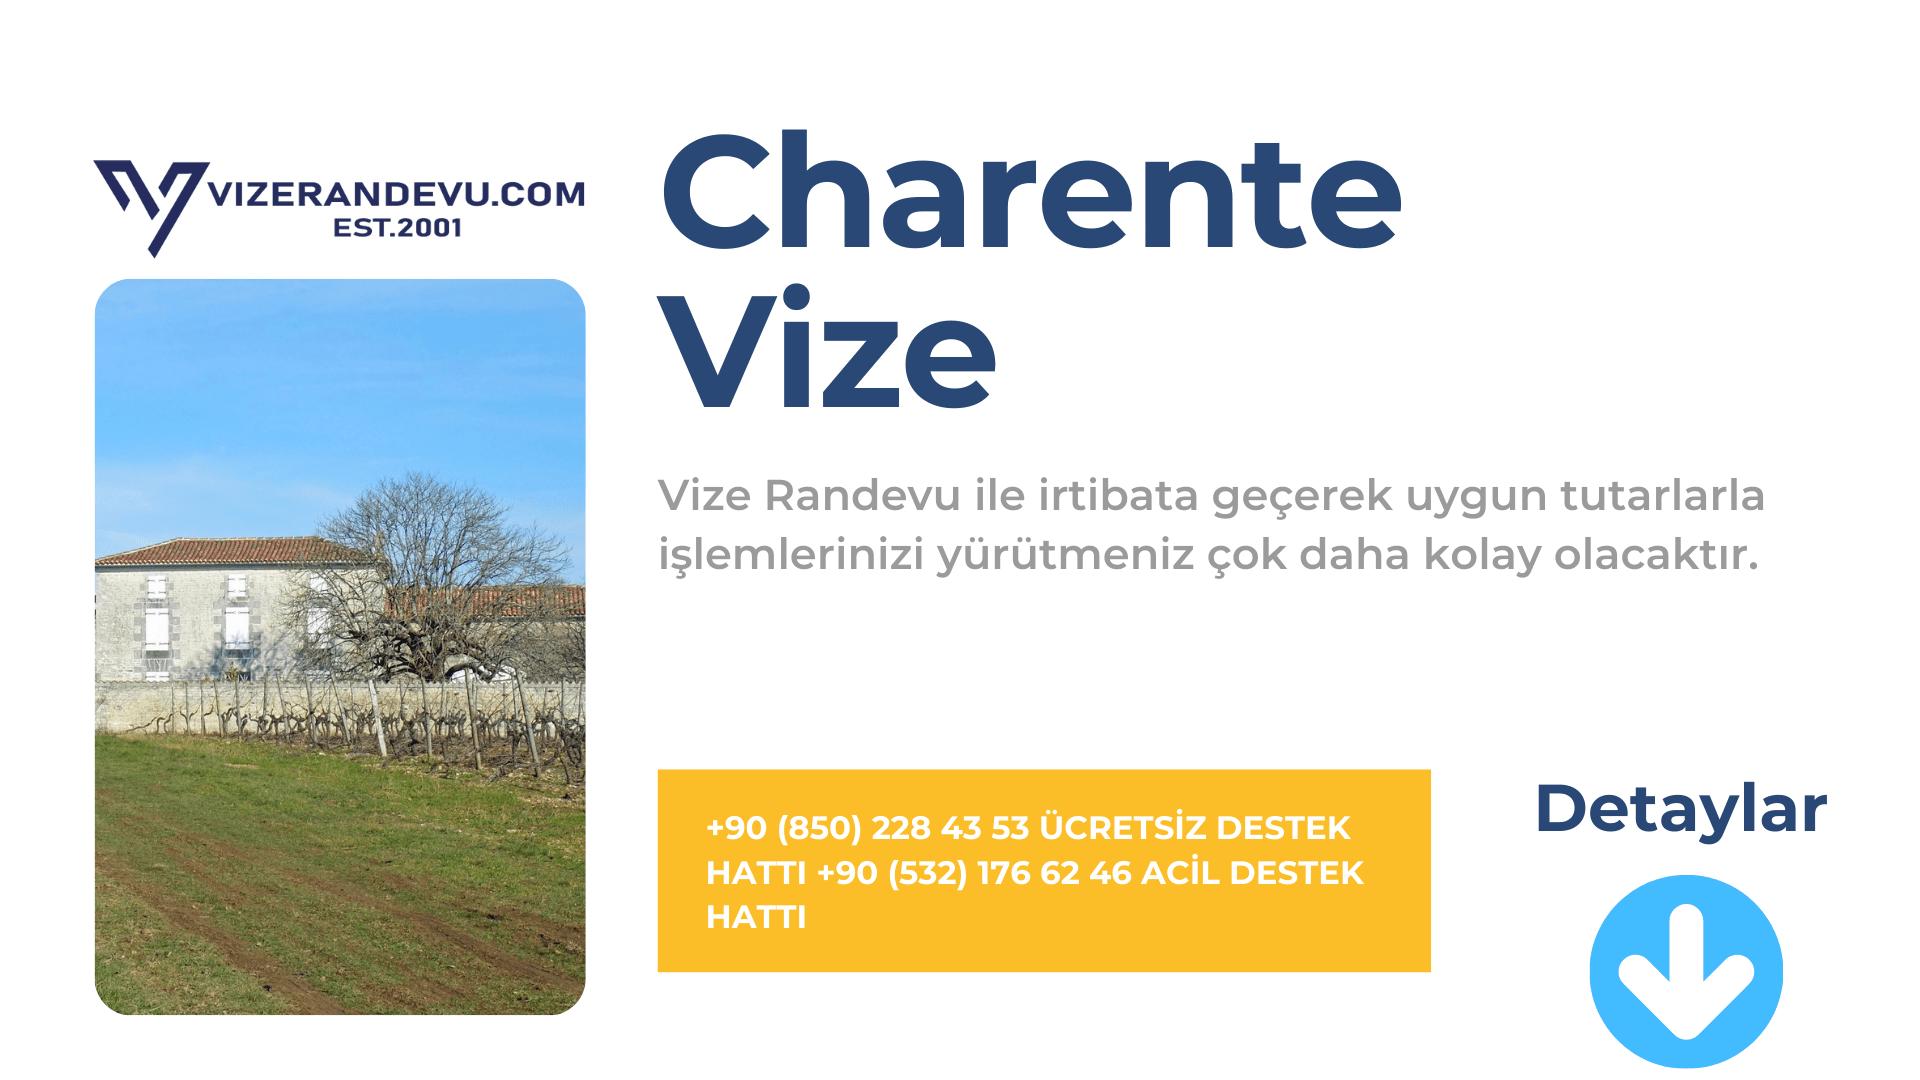 Fransa Charente Vize Başvurusu